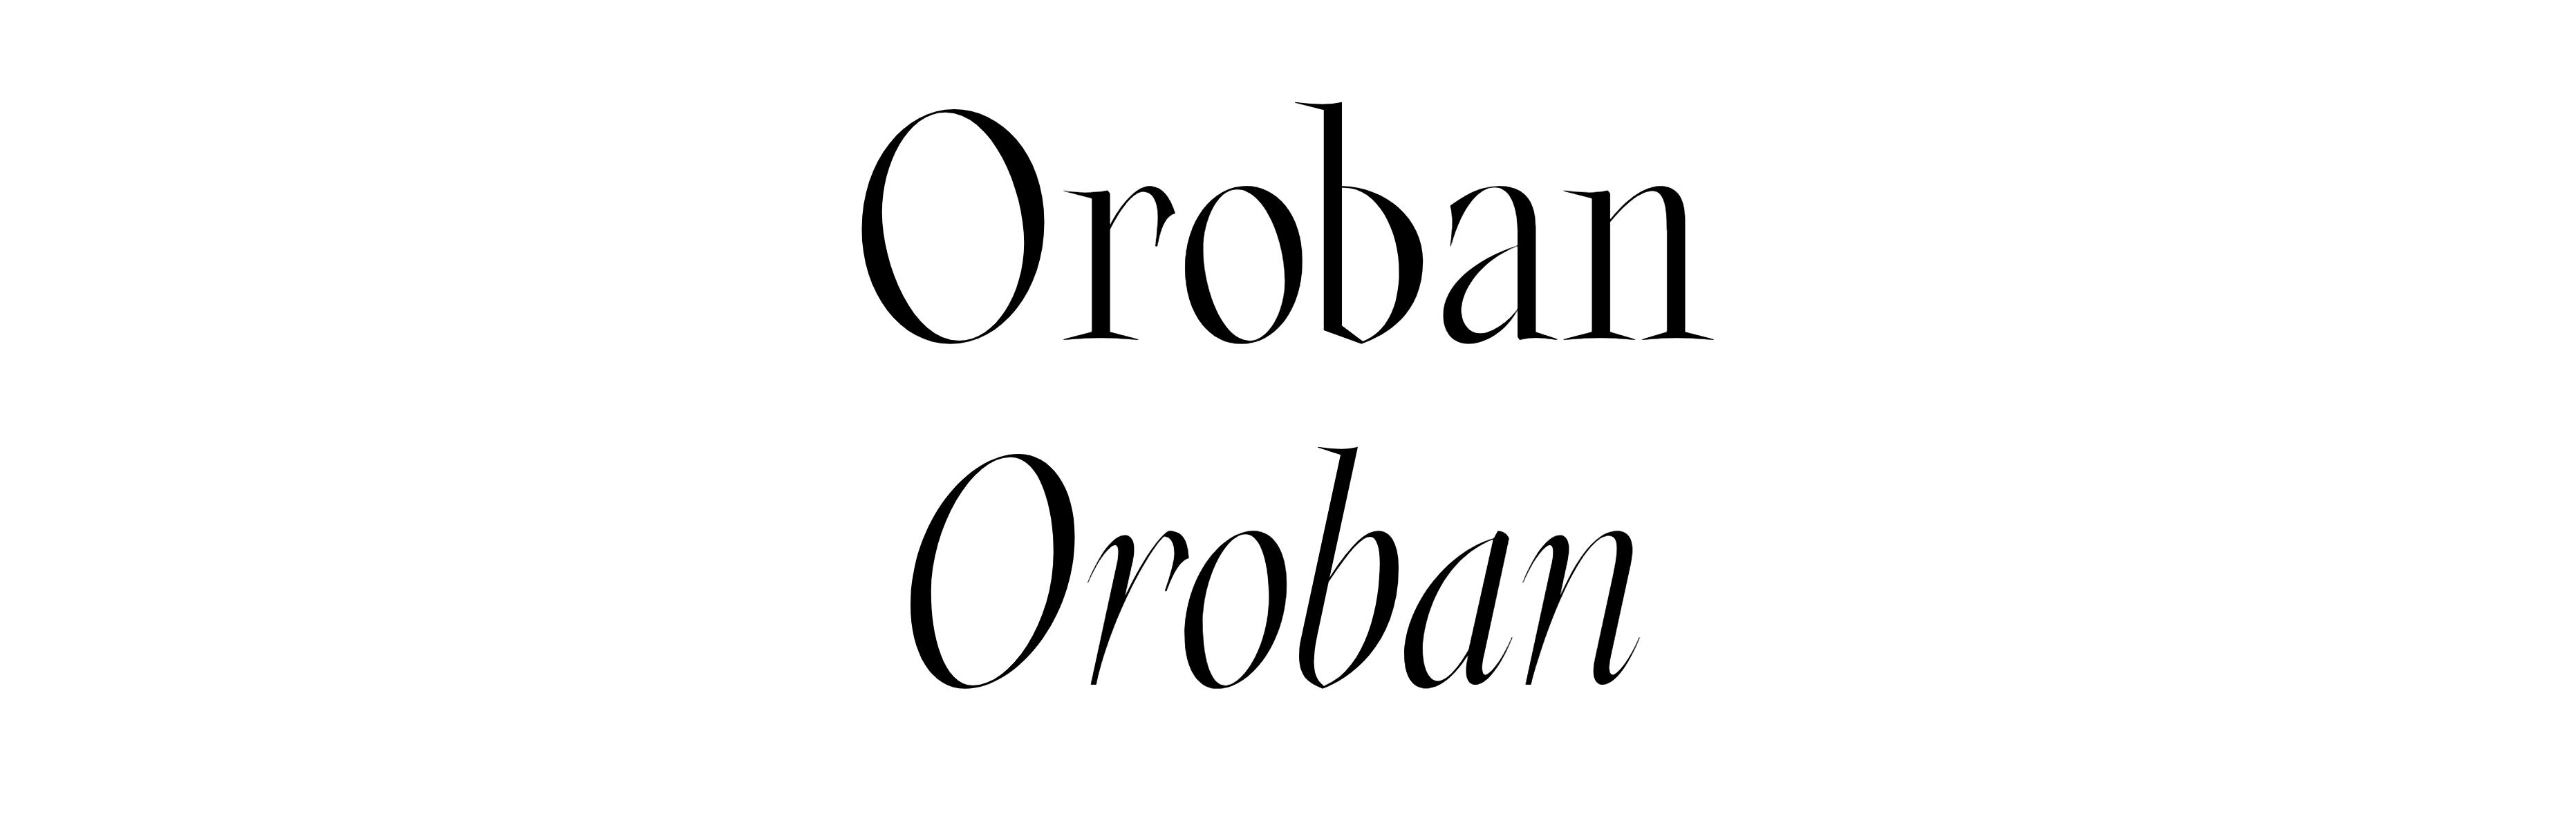 Oroban